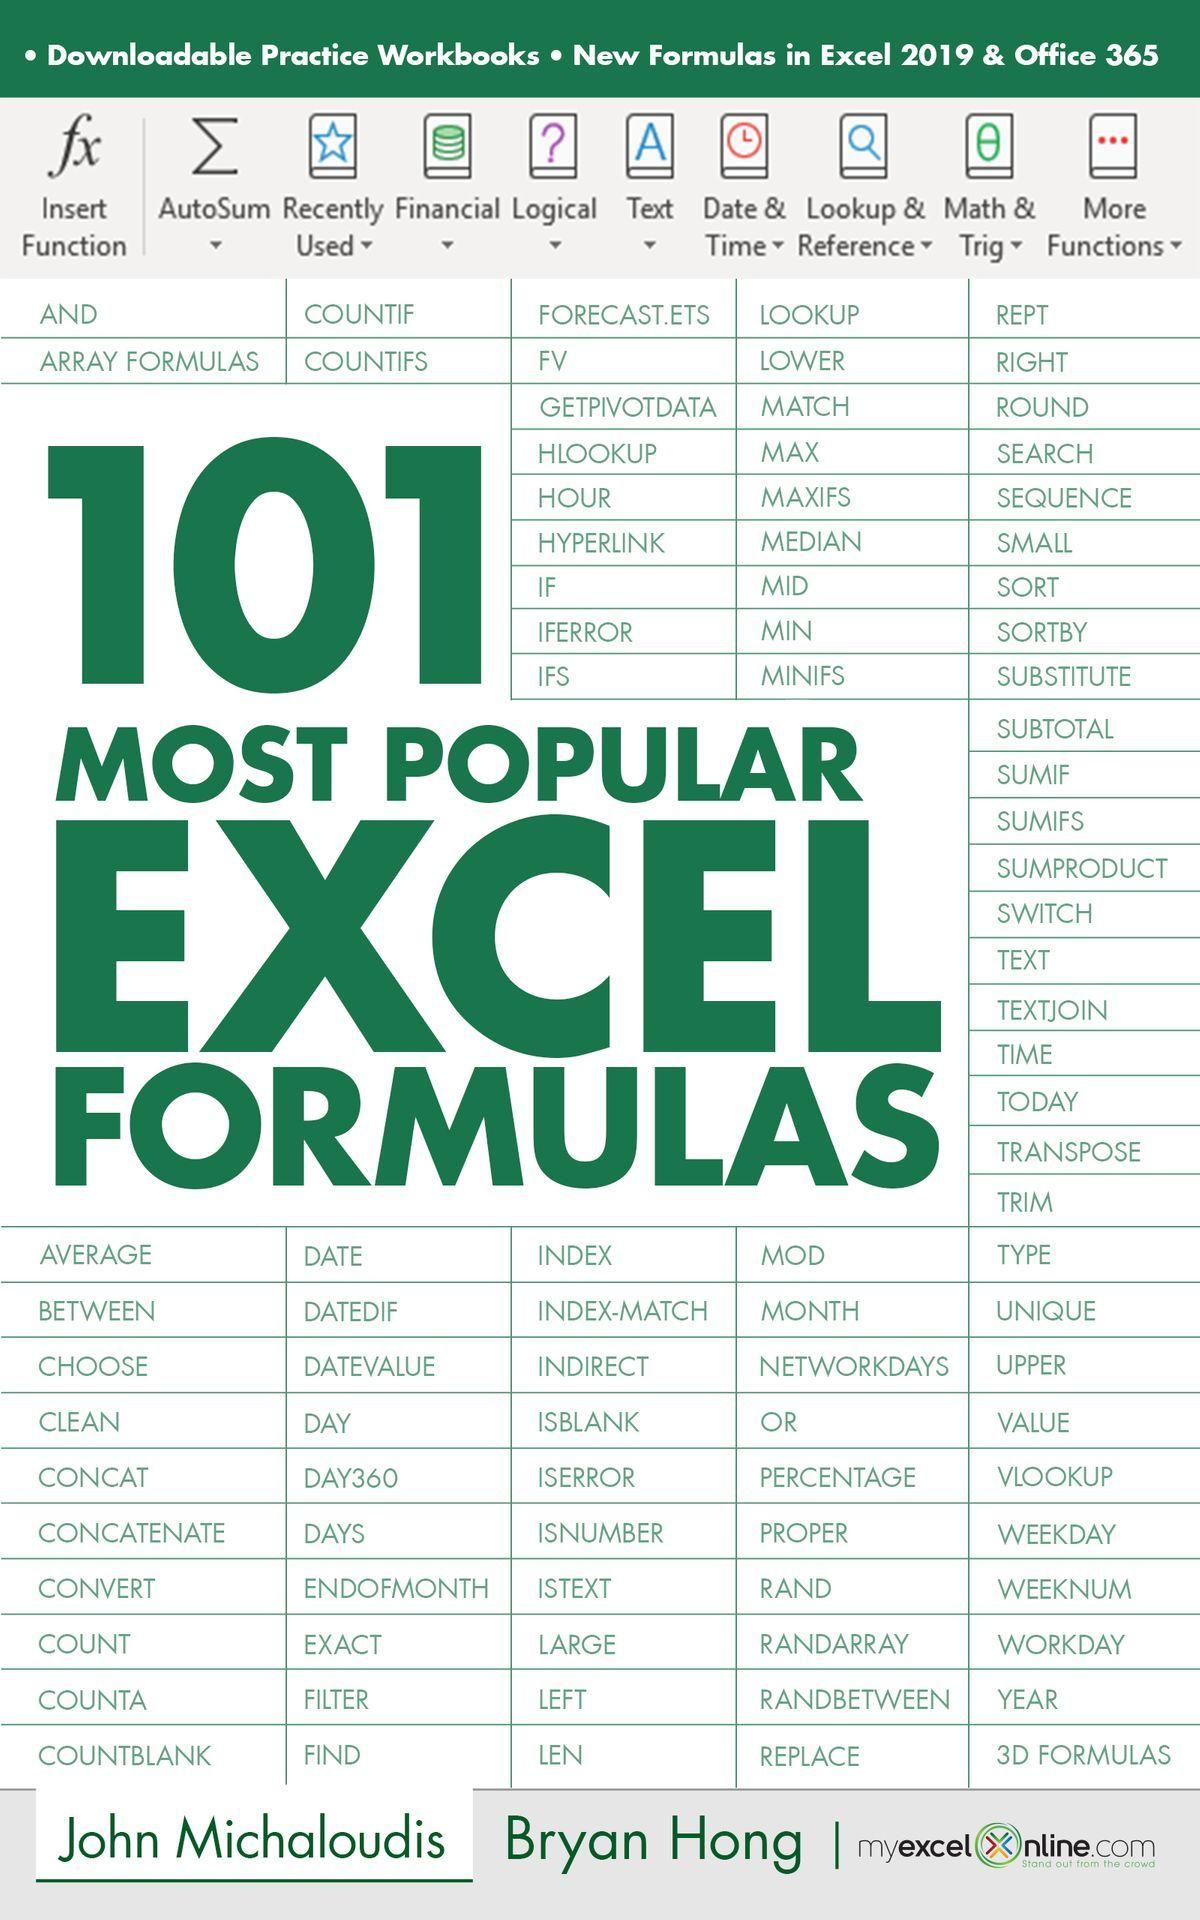 101 Most Popular Excel Formulas Ebook By John Michaloudis Rakuten Kobo In 2021 Microsoft Excel Tutorial Microsoft Excel Formulas Excel For Beginners